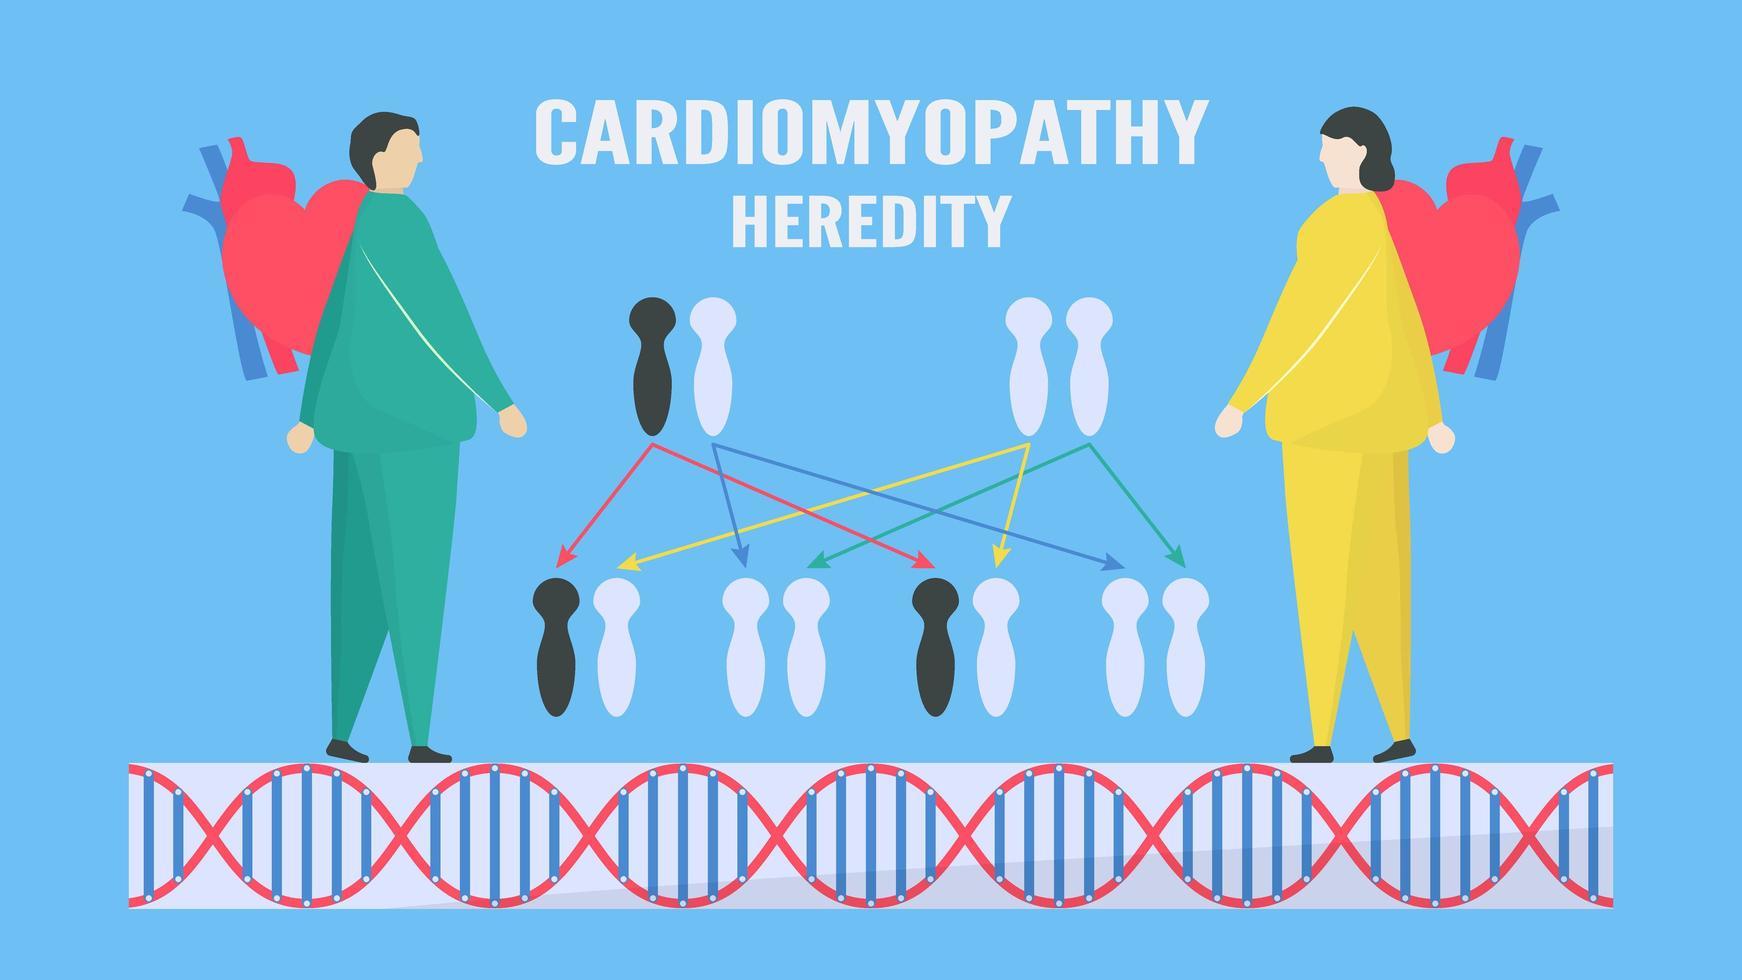 erfelijkheid cardiomyopathie concept vector